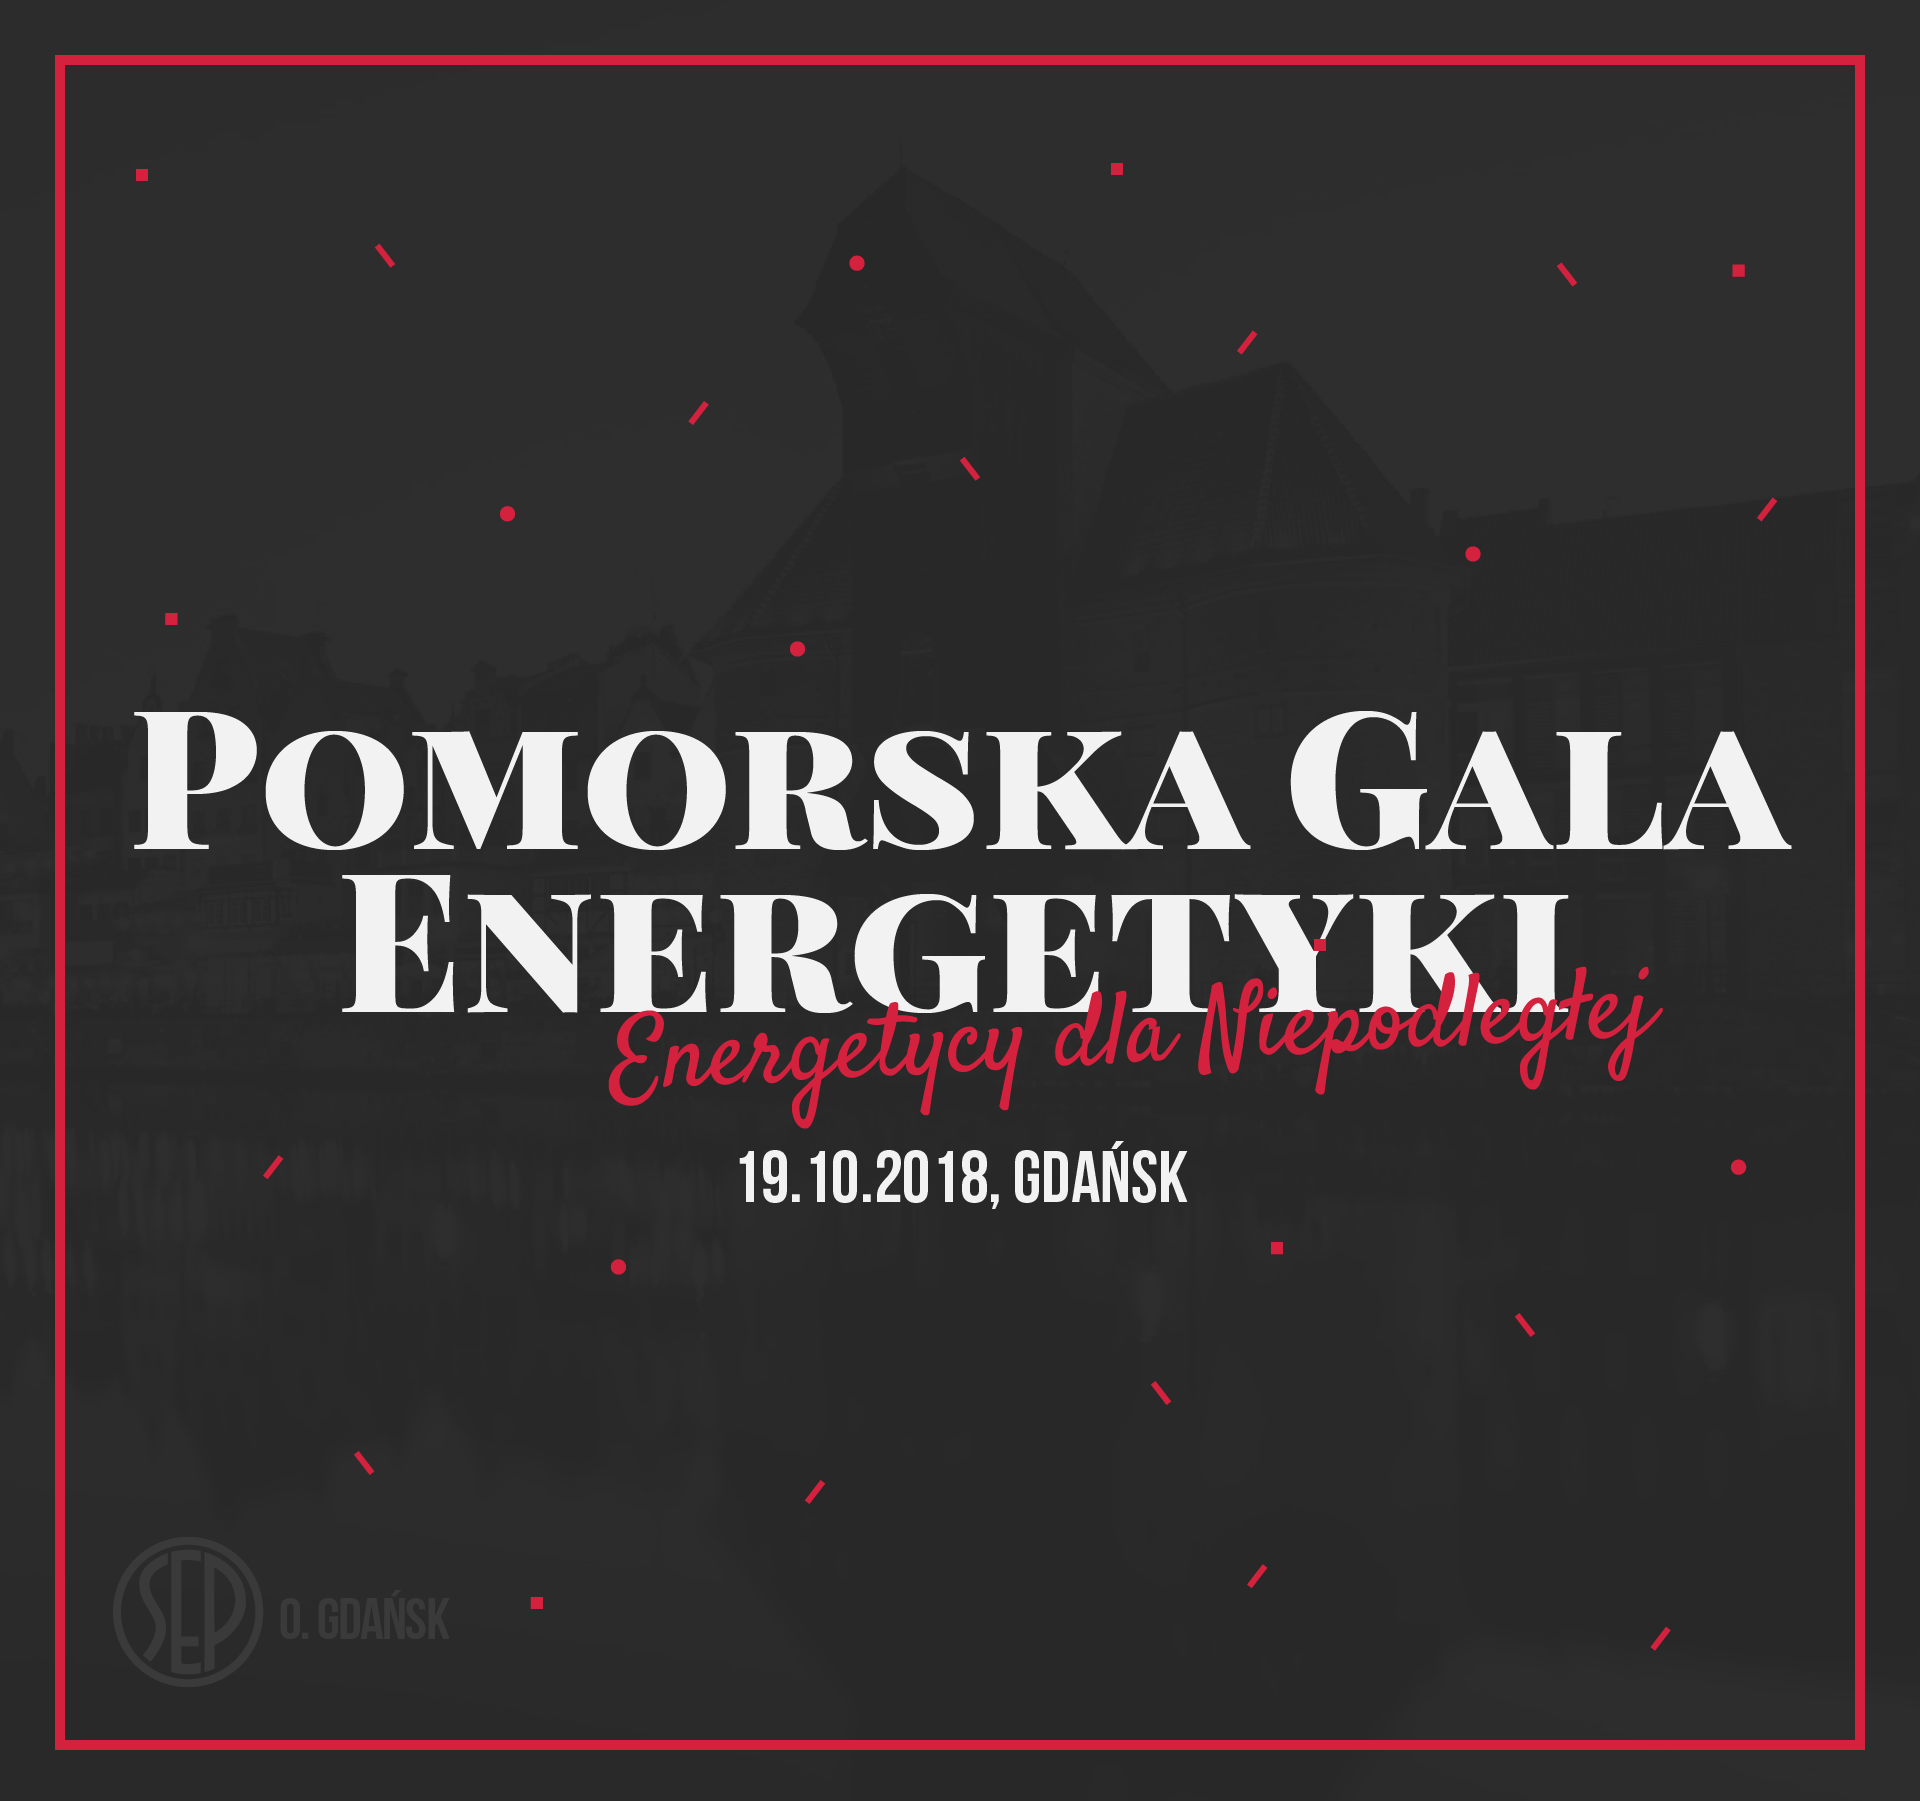 Pomorska Gala Energetyki